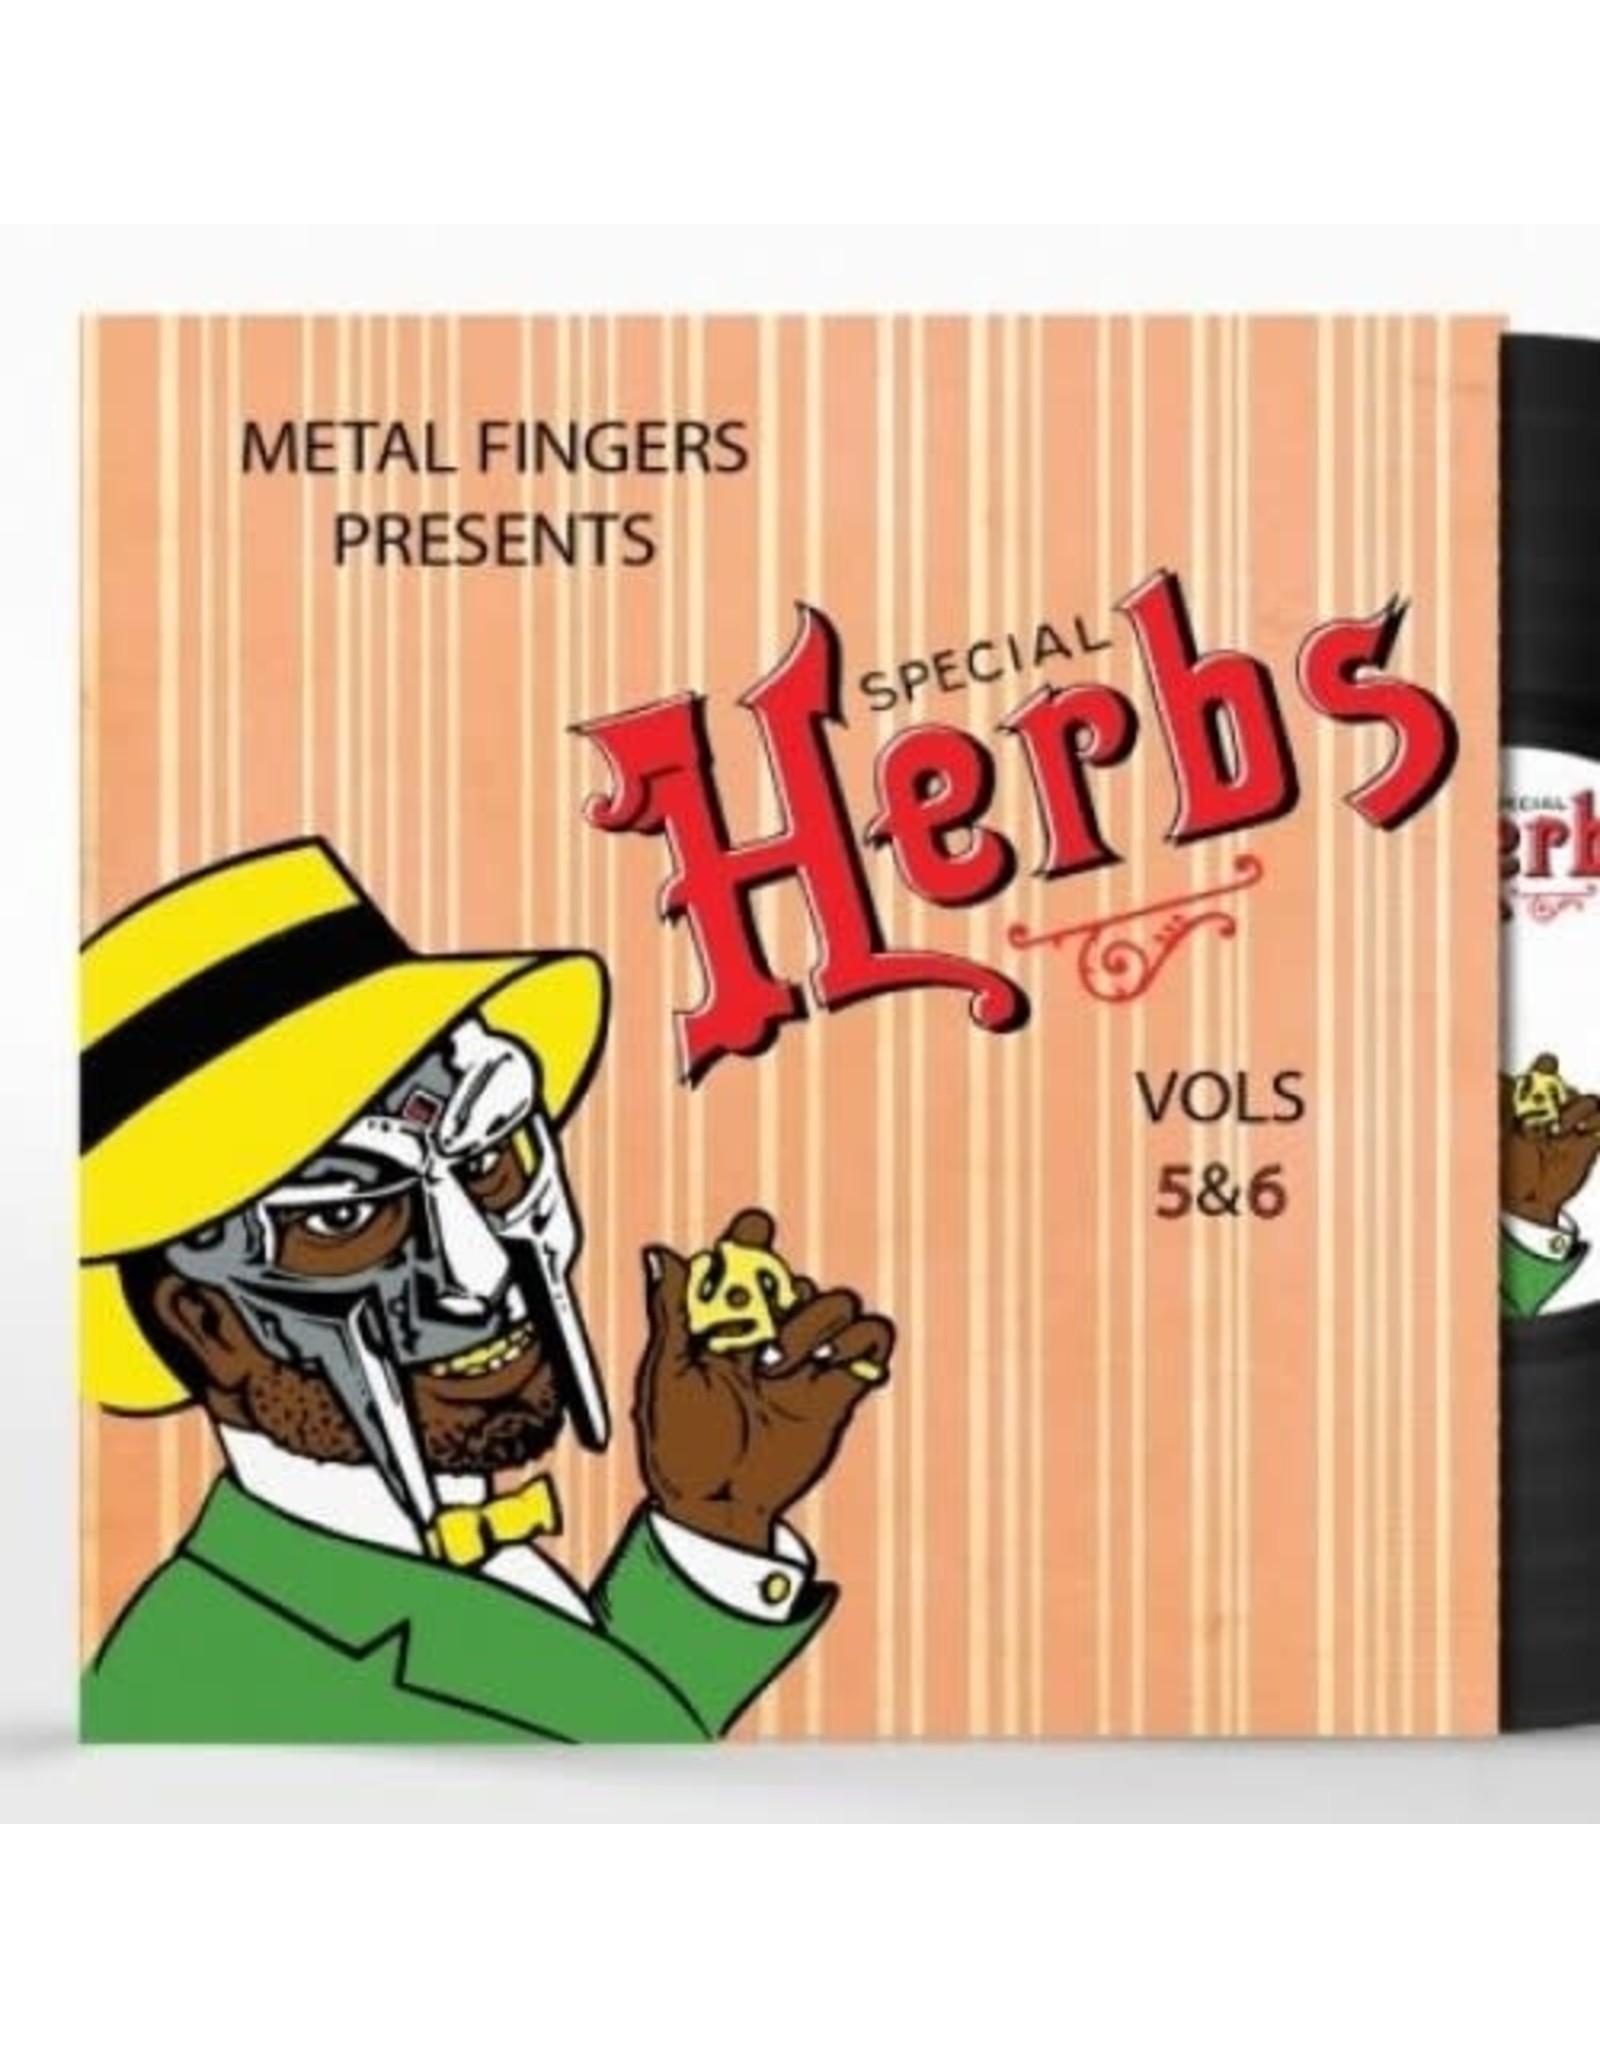 New Vinyl MF DOOM - Special Herbs Vol. 5 & 6 2LP